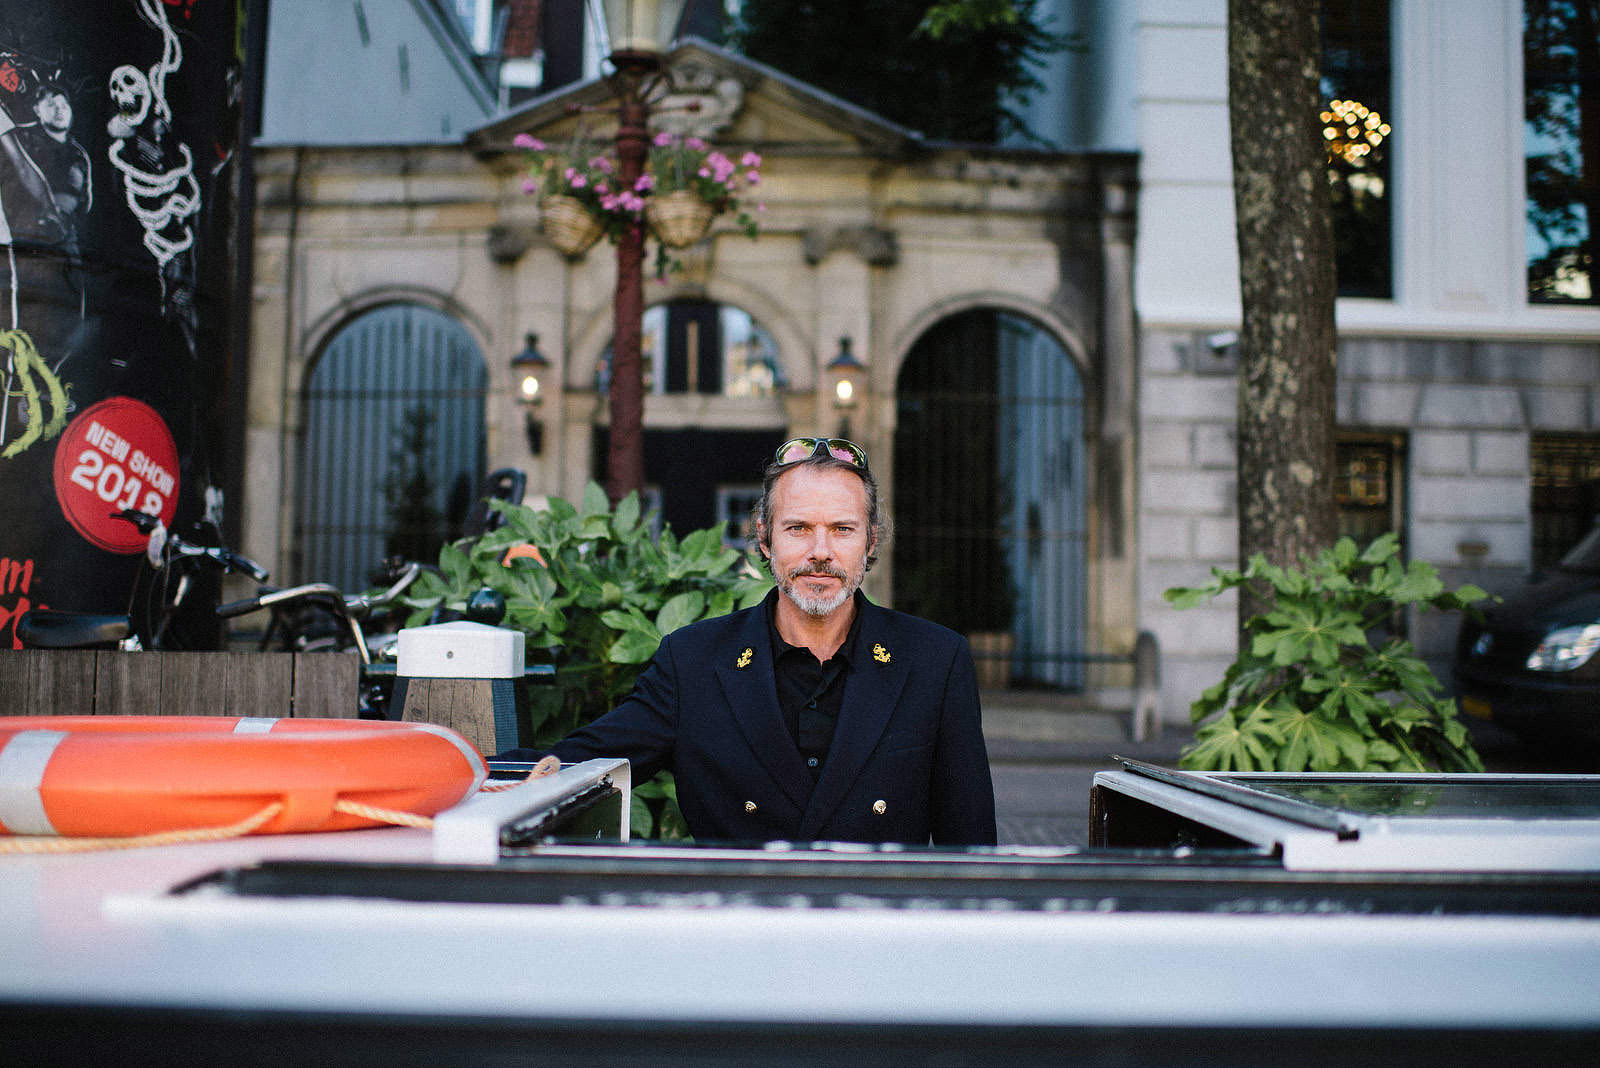 Fotograf Konstanz - Destination Wedding Photographer Amsterdam 093 - Destination Wedding Amsterdam  - 198 -